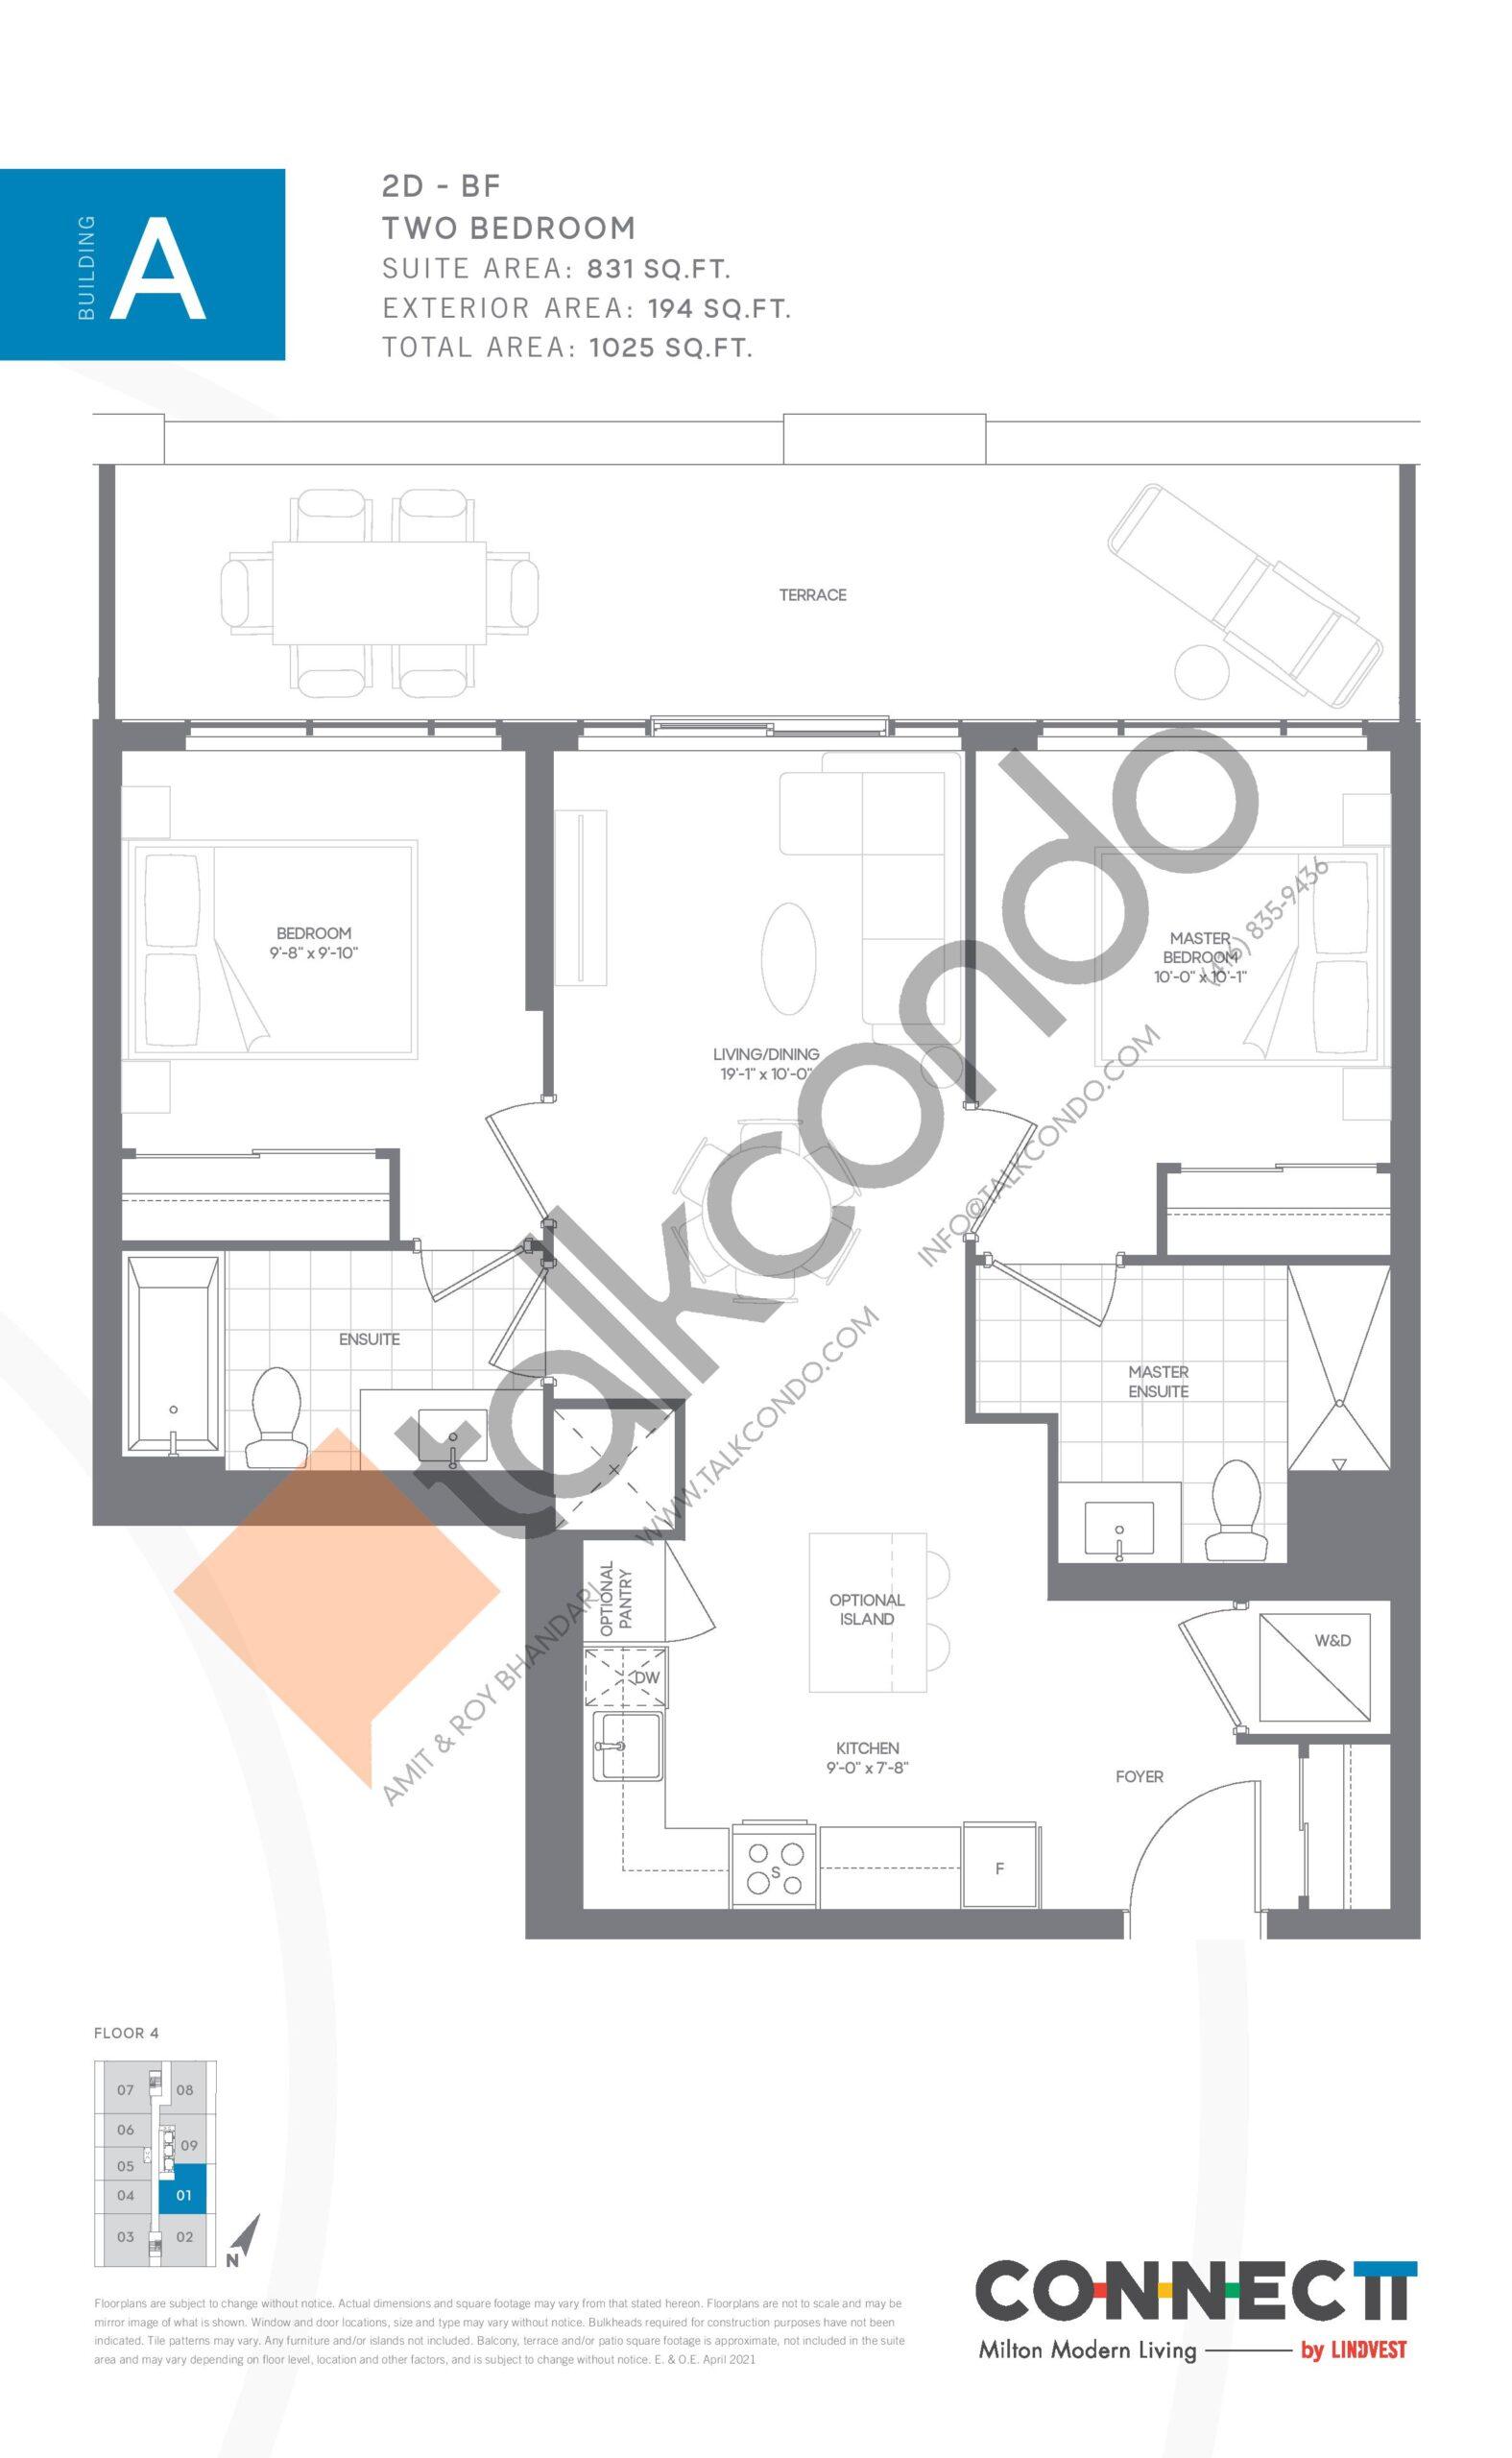 2D - BF Floor Plan at Connectt Urban Community Condos - 831 sq.ft